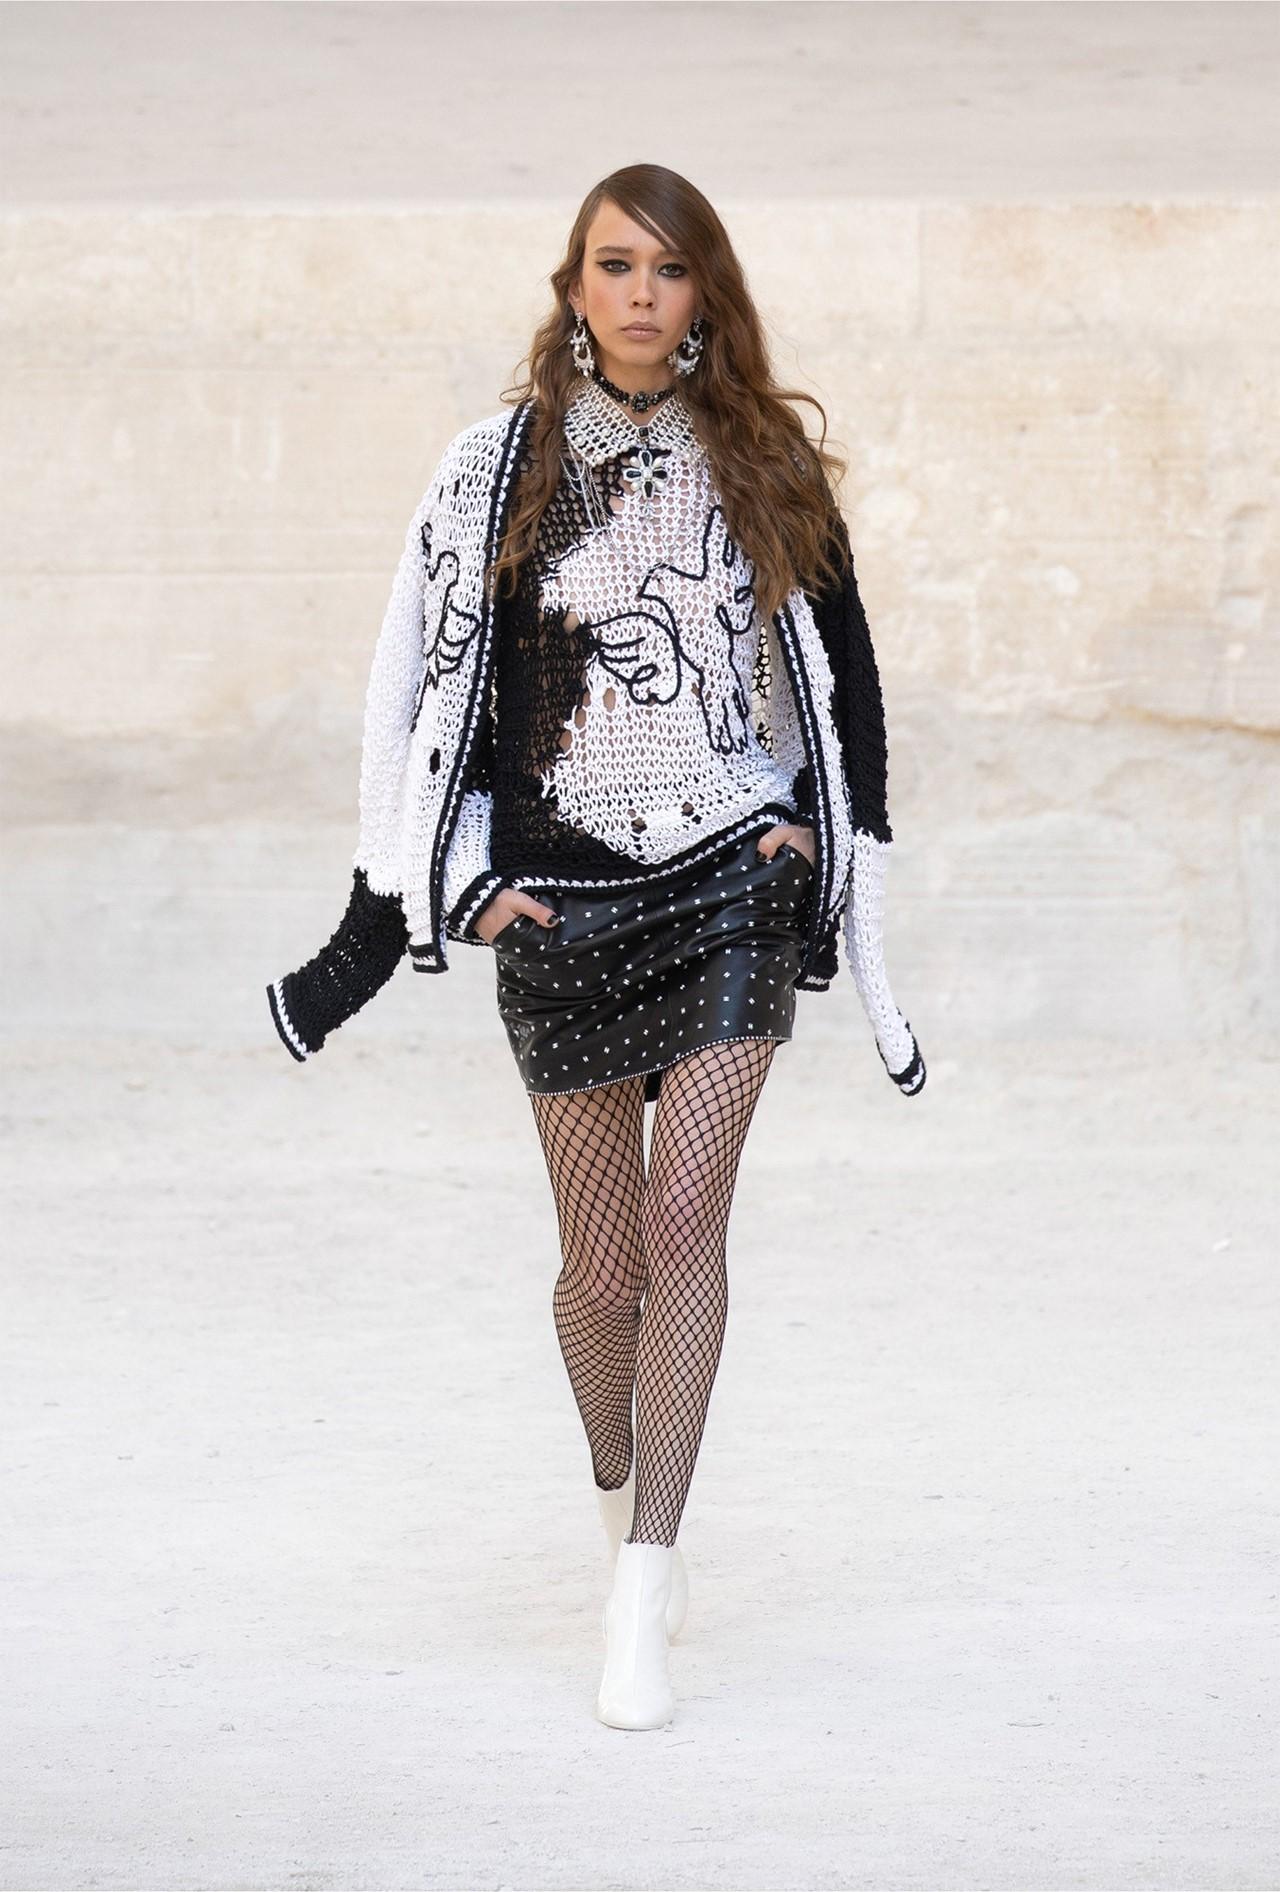 Chanel_Cruise_2022_Fashionela (24)